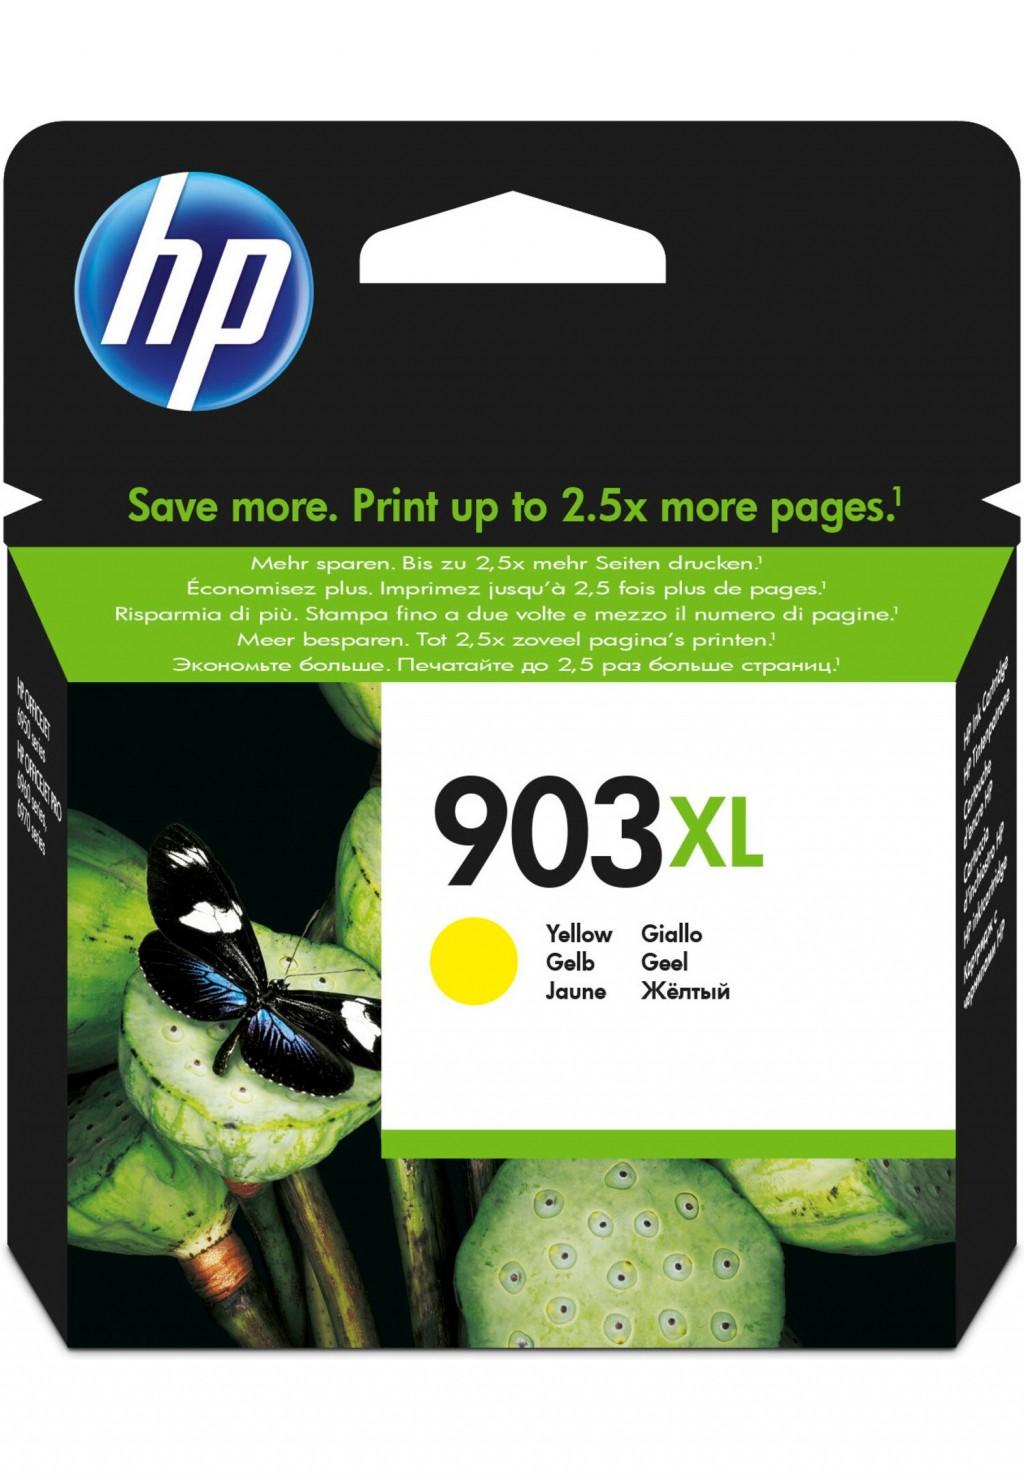 HP 903XL ink cartridge, yellow, high capacity